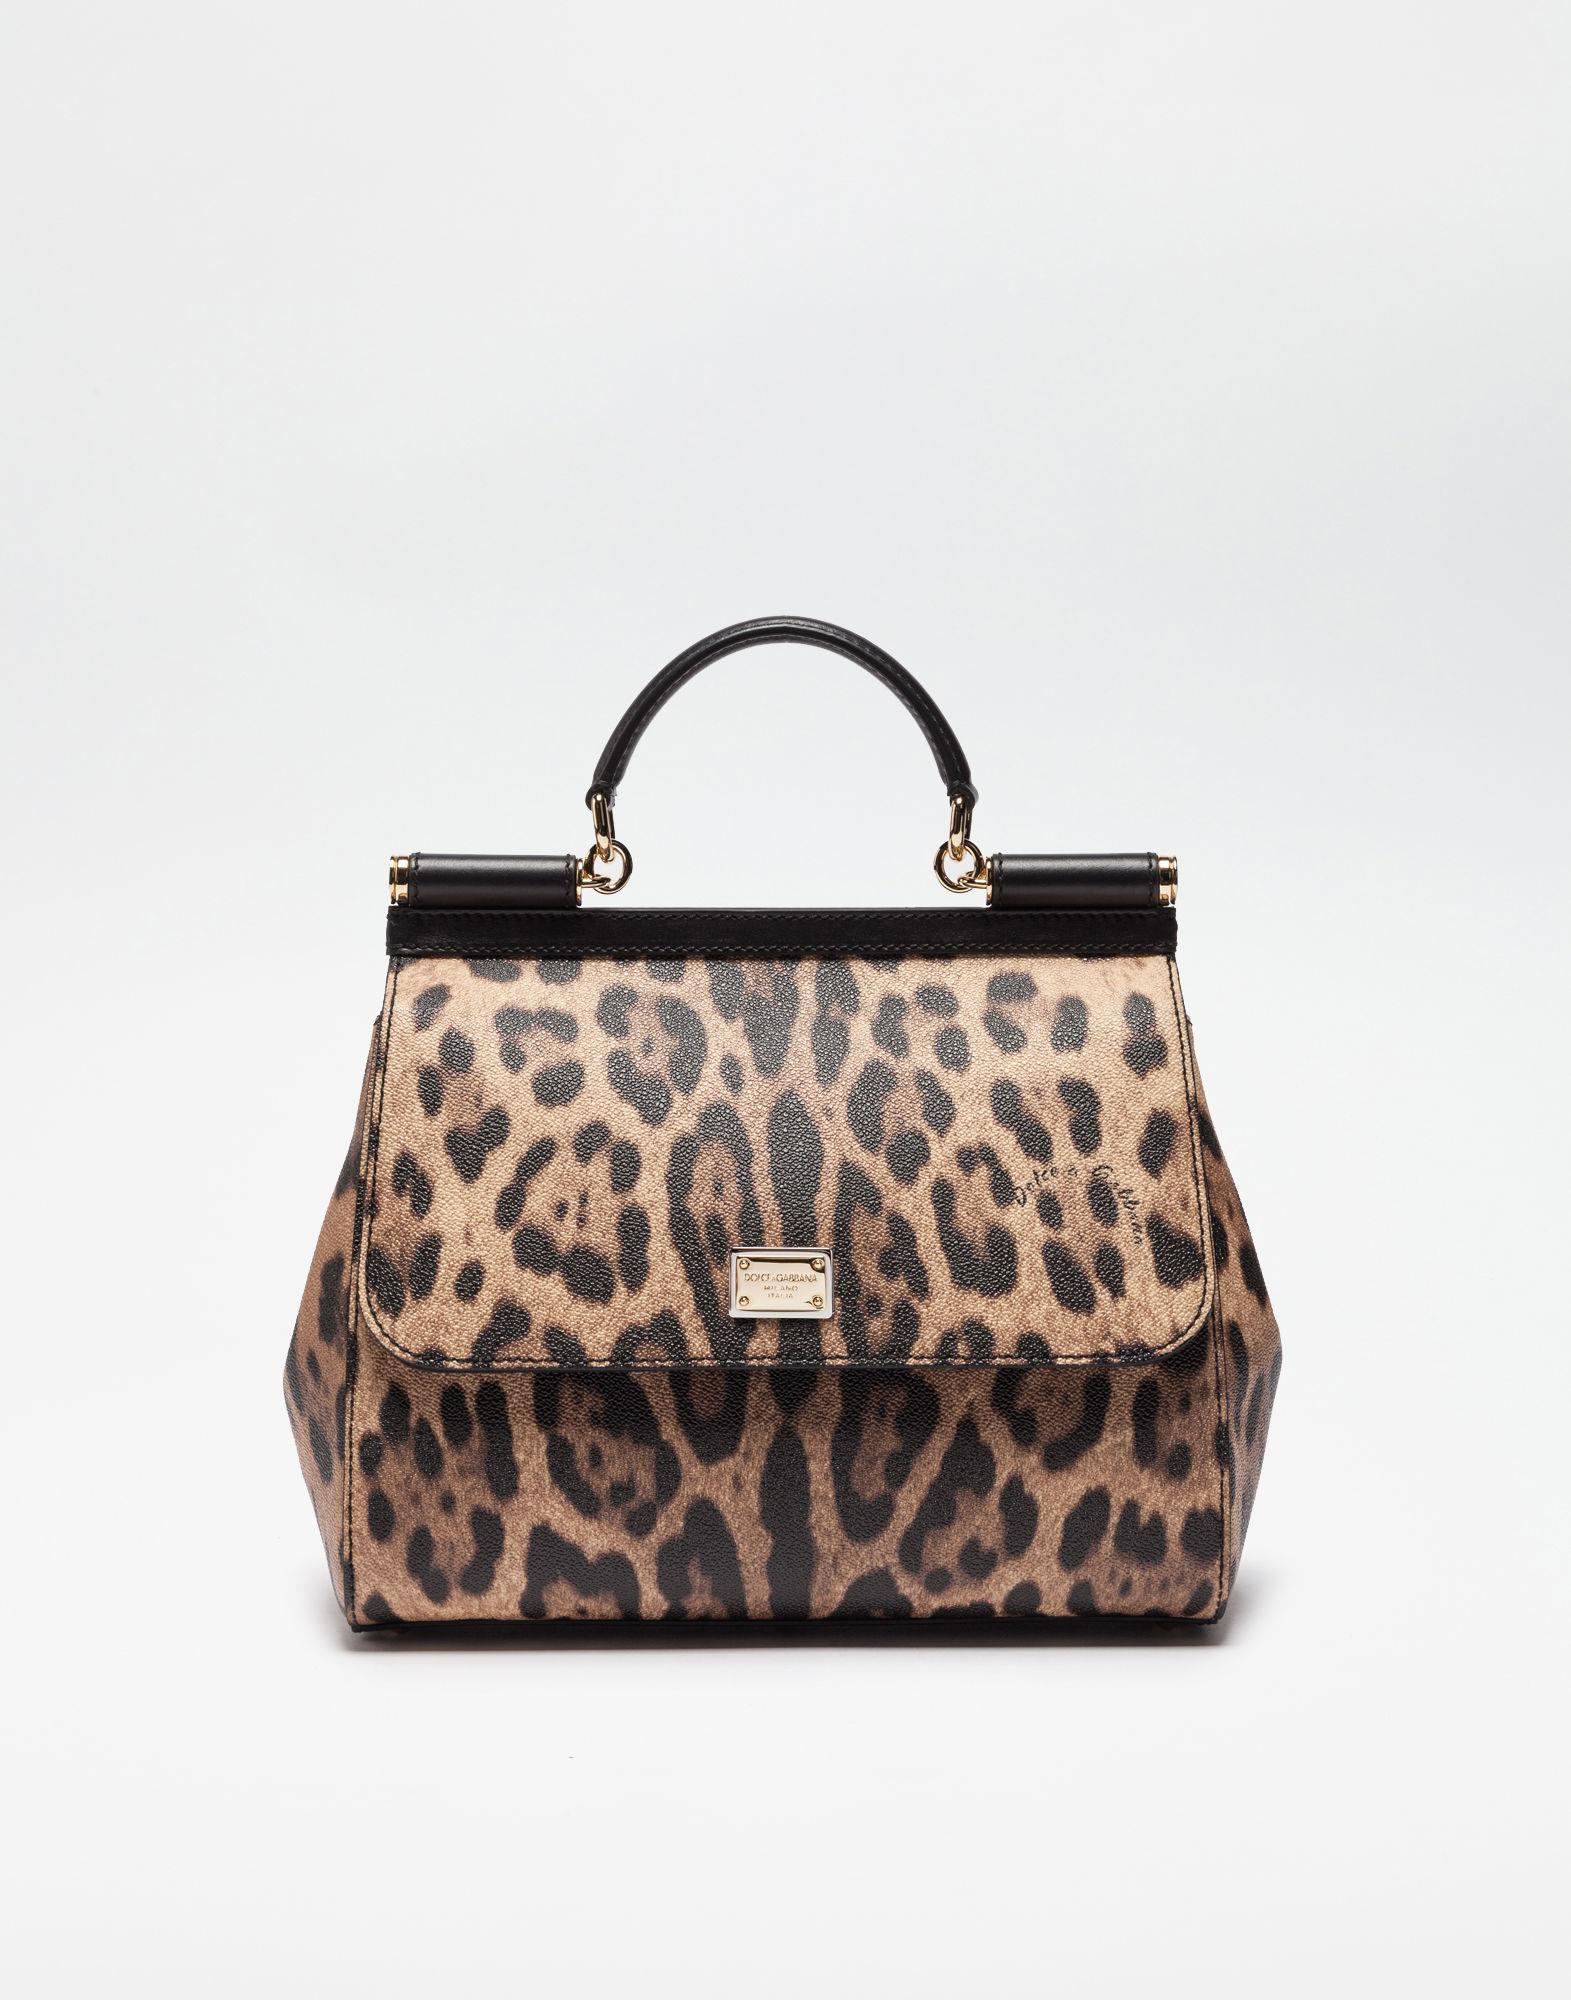 b341d7b2f156 Dolce   Gabbana. Women s Brown Regular Sicily Bag In Leopard Textured  Leather